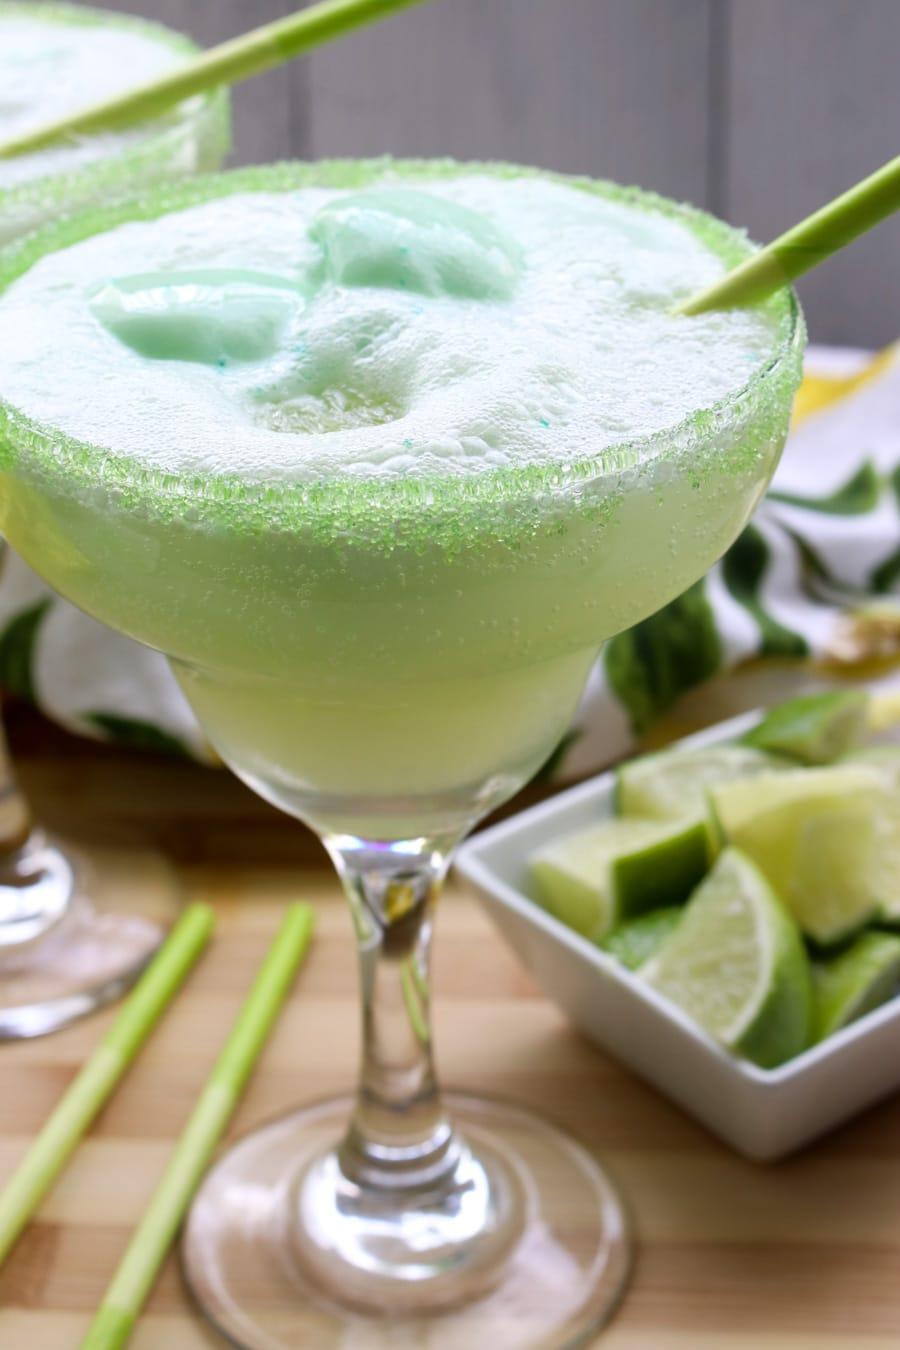 close up shot of an ice margarita